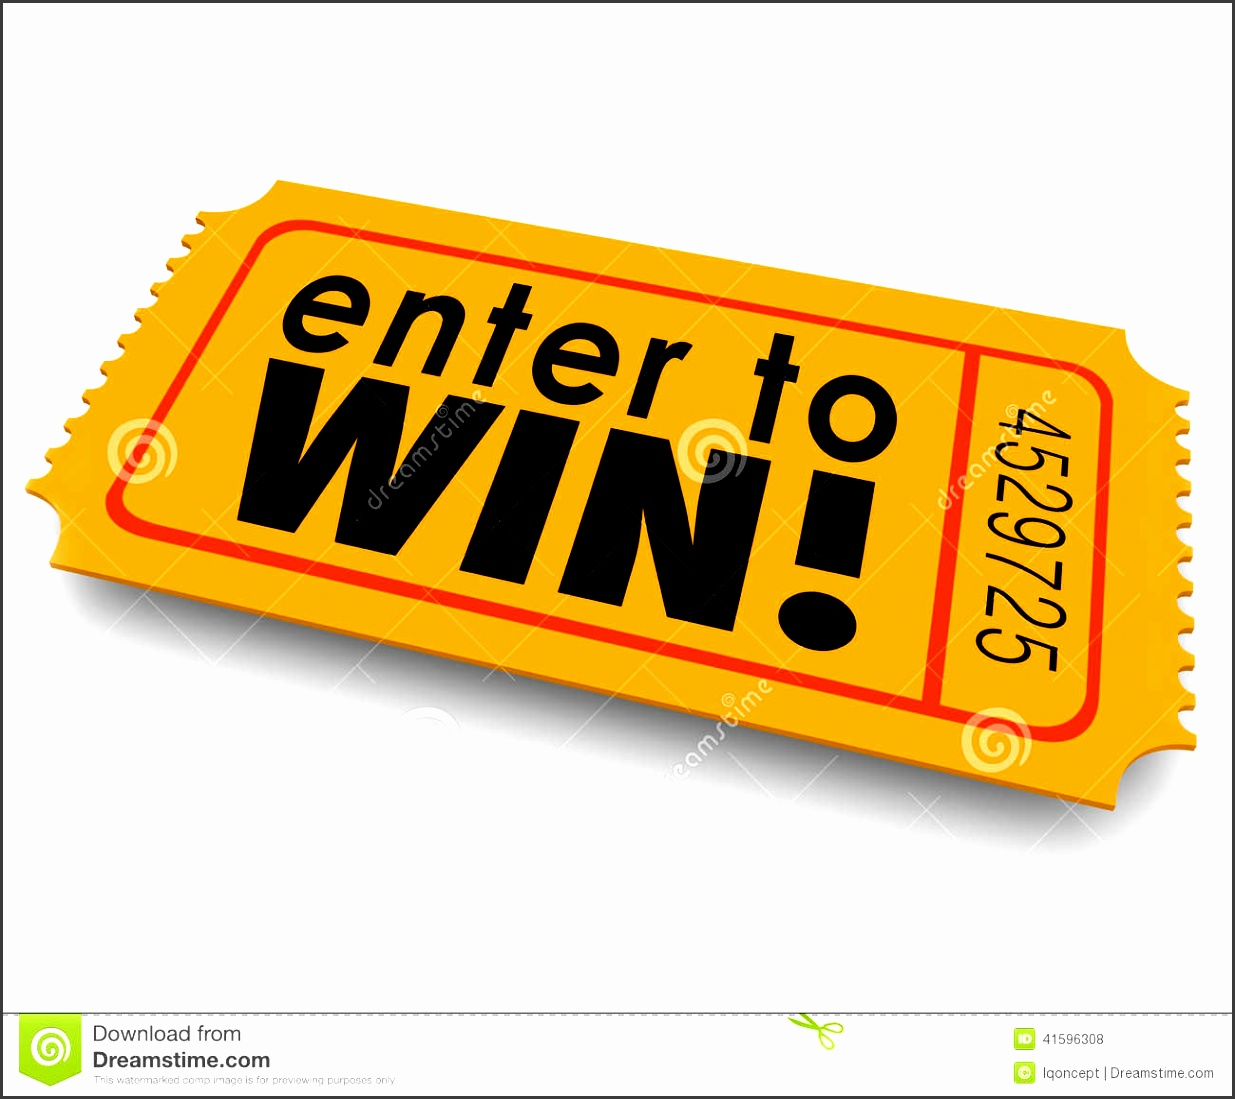 enter to win raffle ticket winner lottery jackpot royalty free illustration